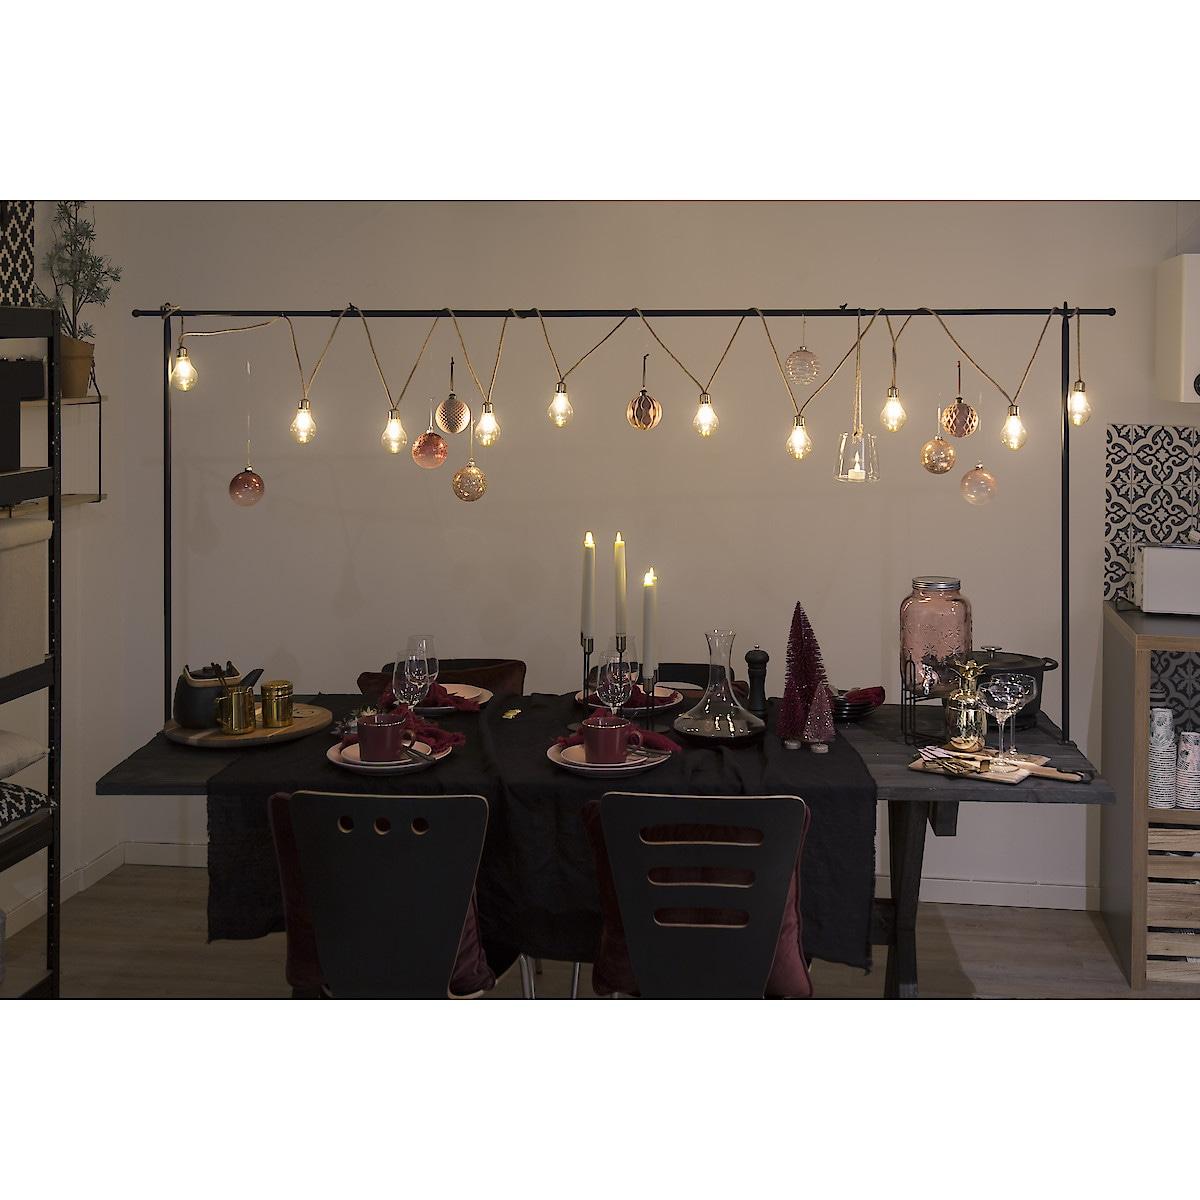 Hanger Rack for a Table